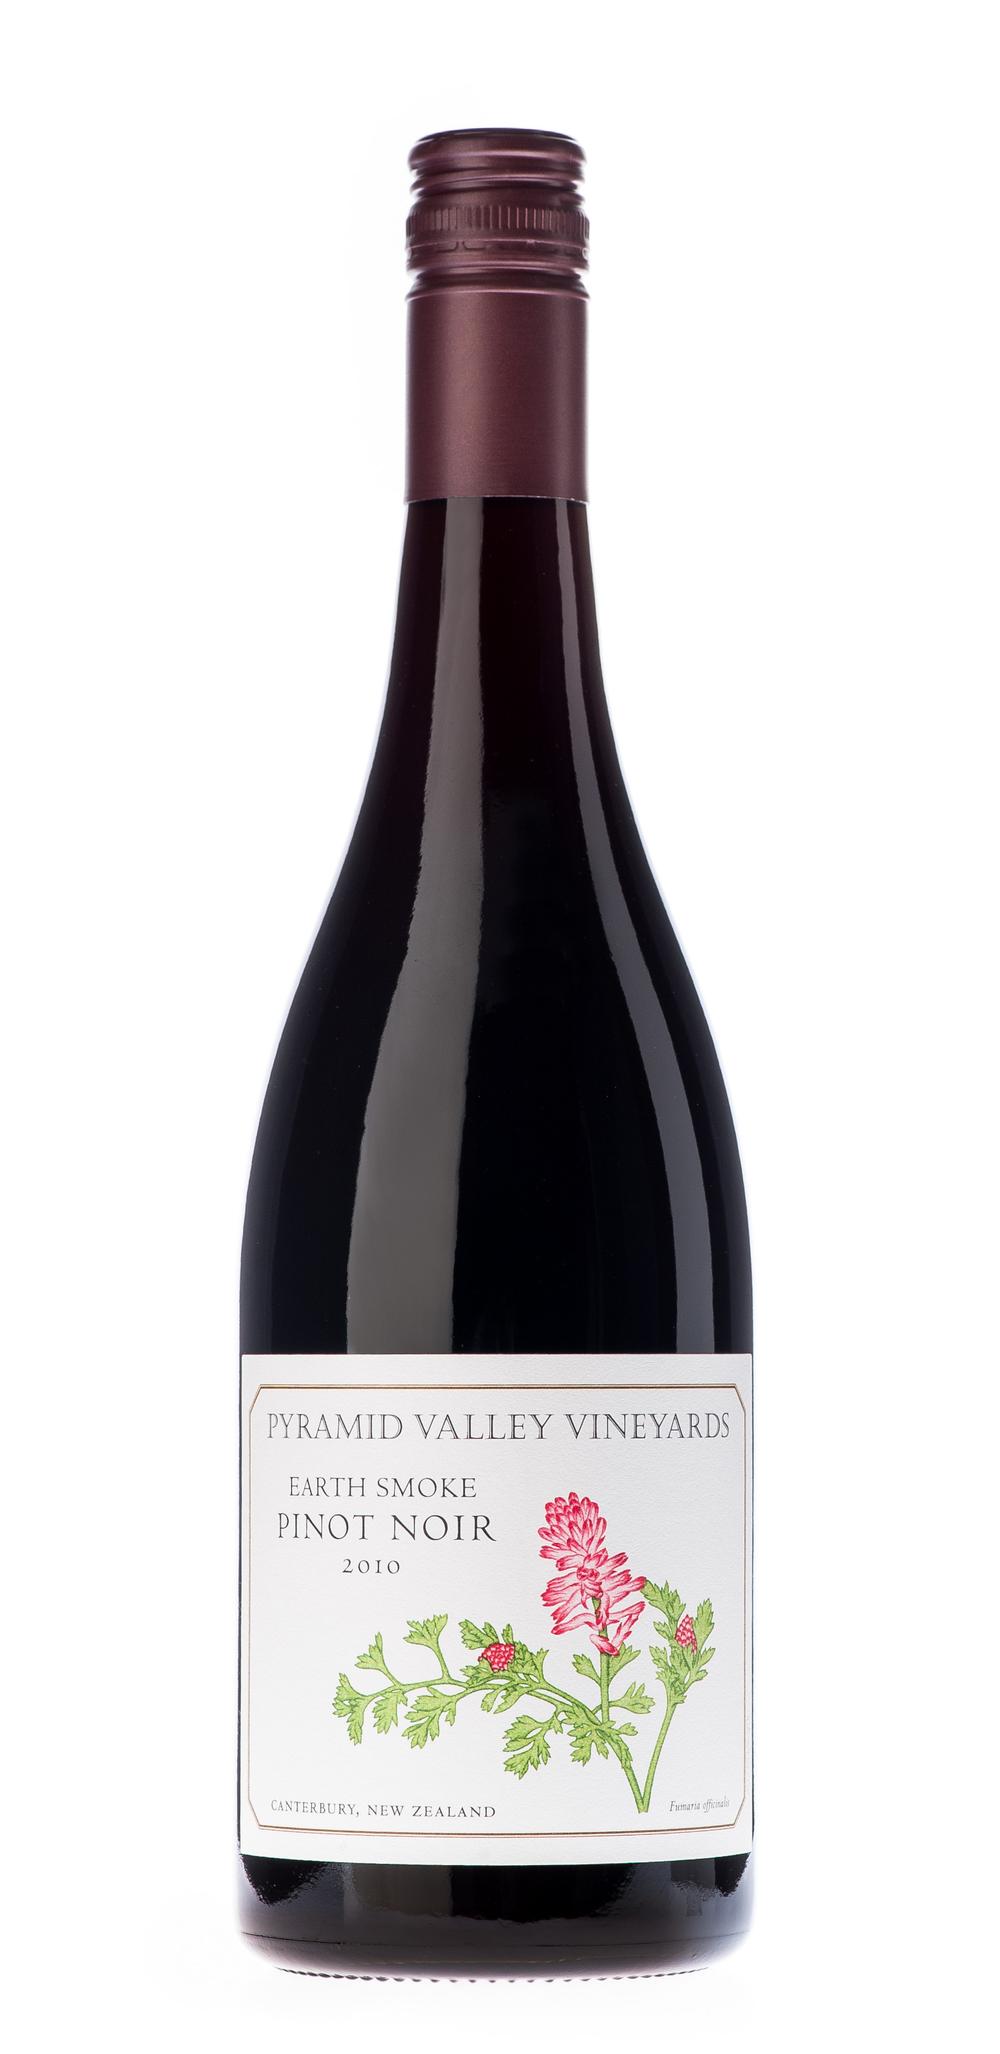 Pyramid Valley Earth Smoke Pinot Noir 2010 WA 91-93